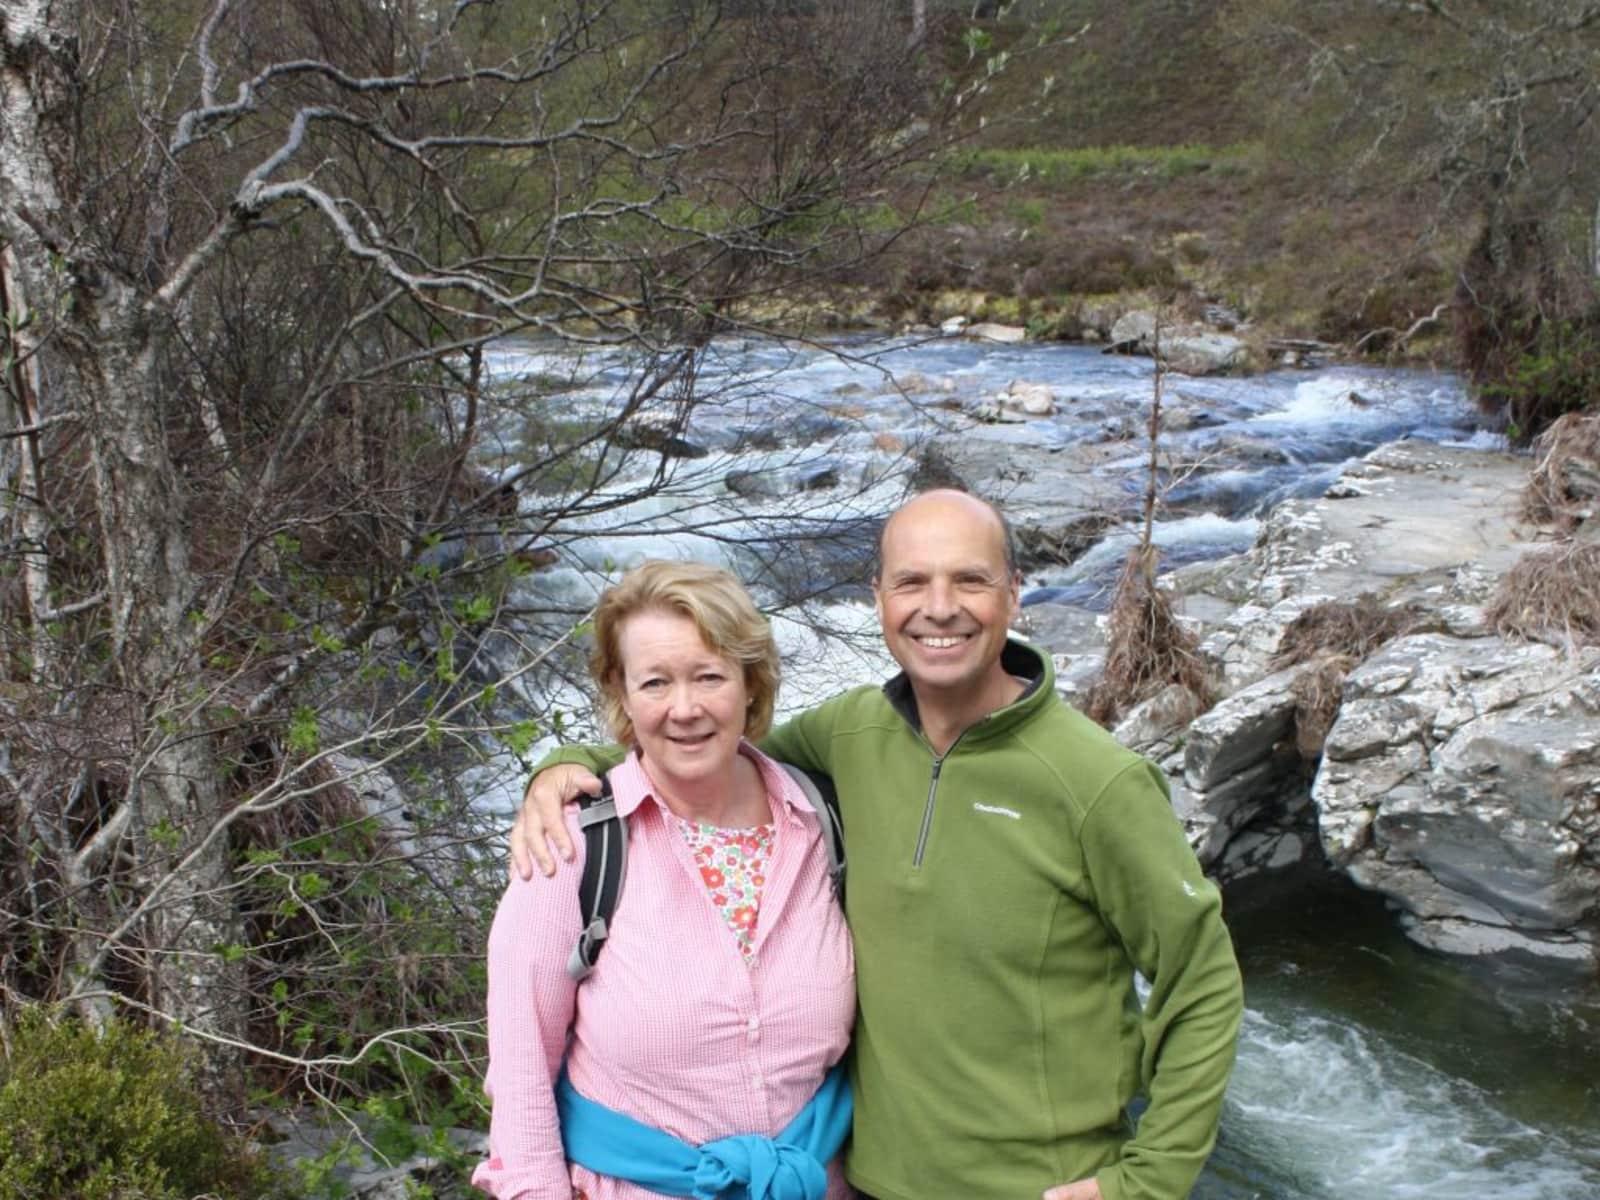 John & Sue from Great Bookham, United Kingdom